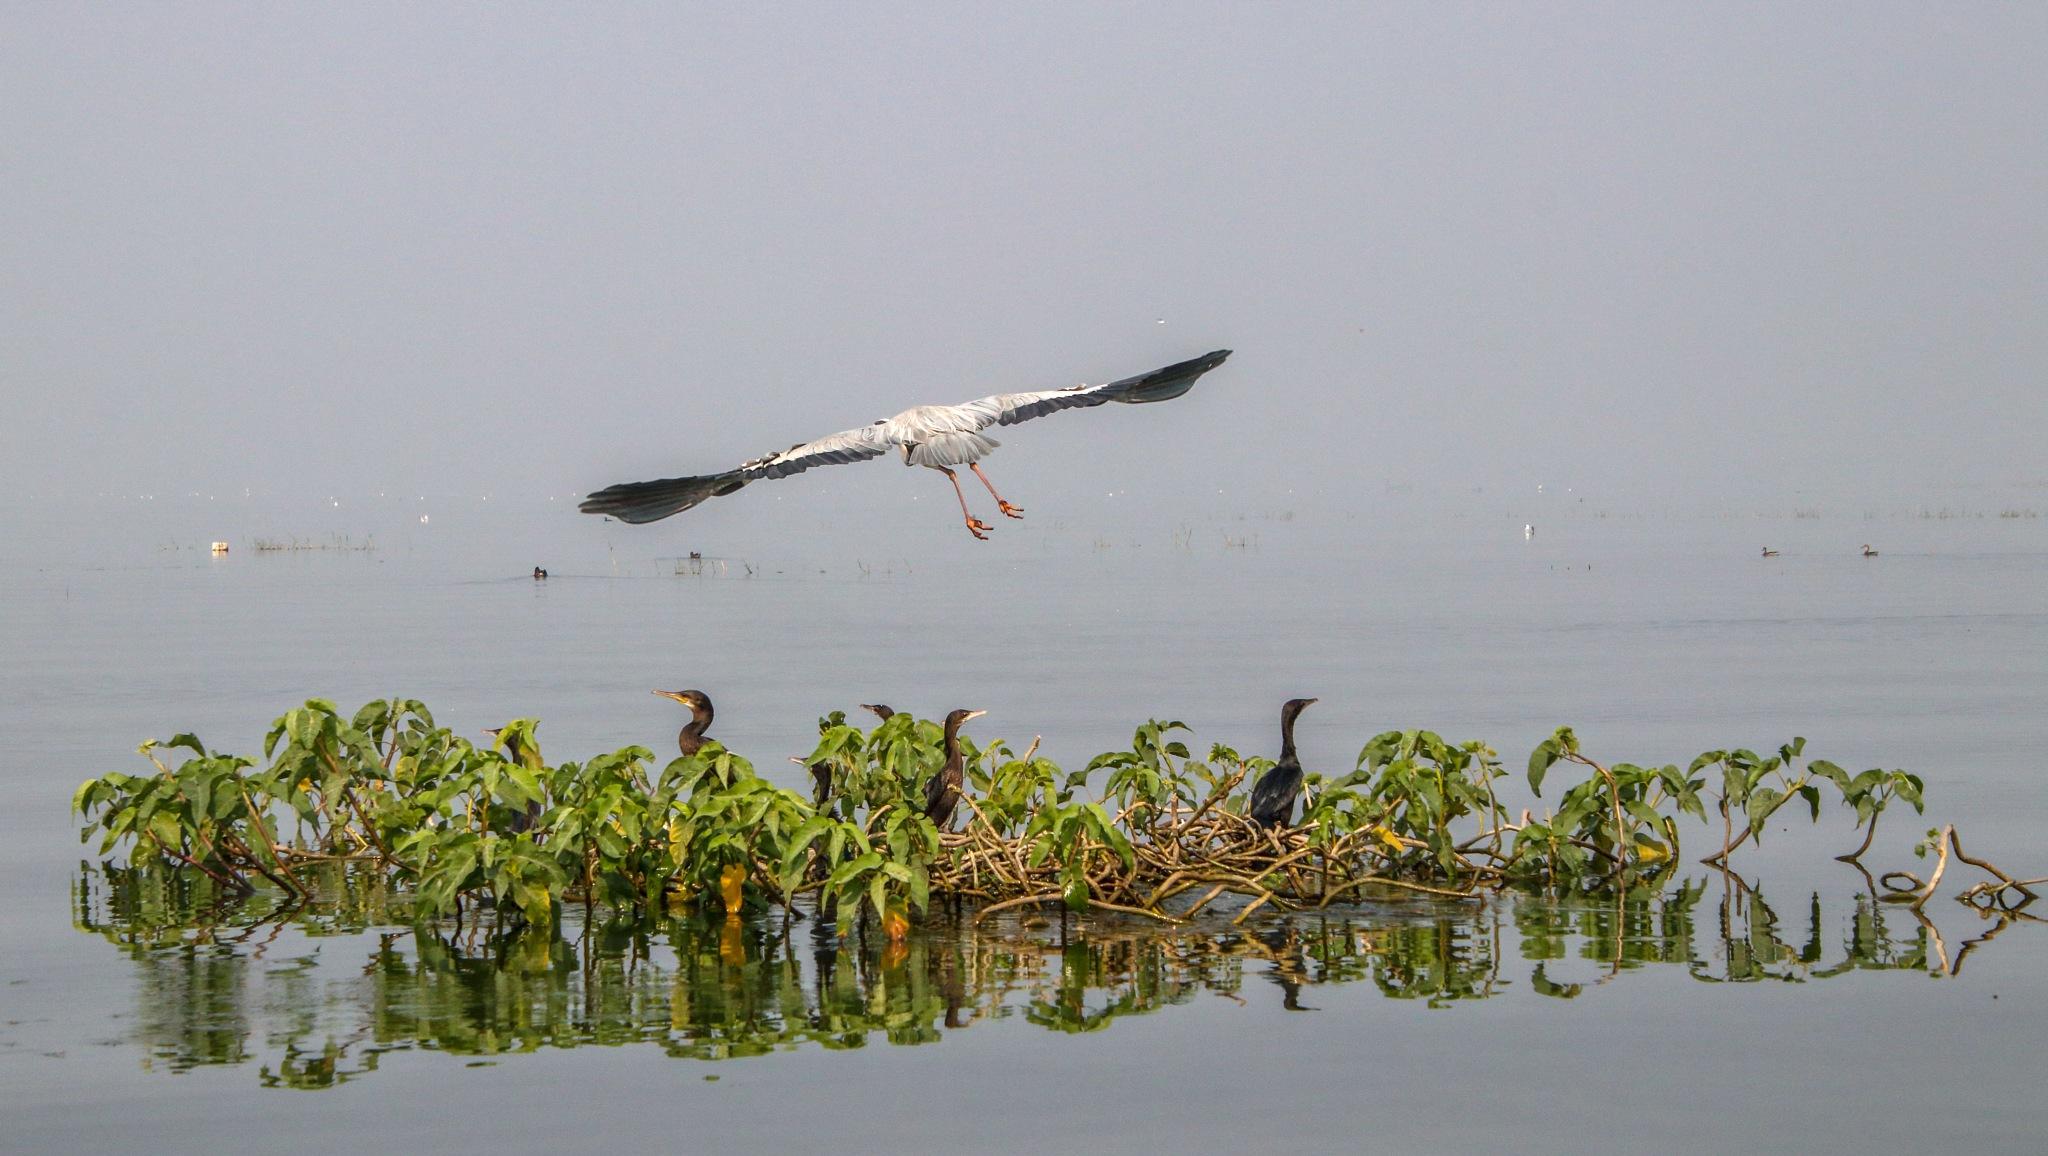 Perfect take off by RAMANUJAN